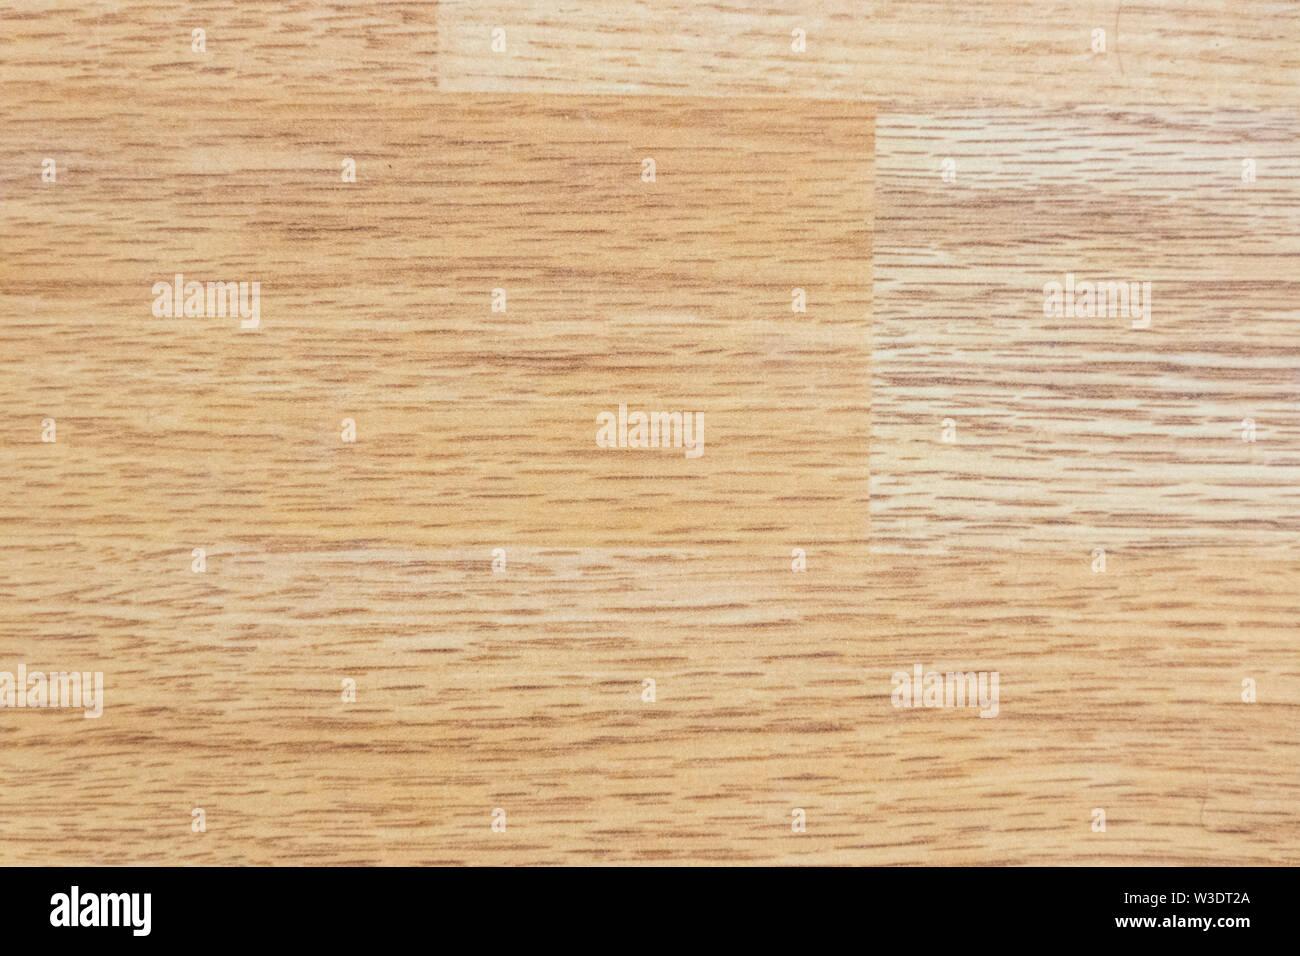 Grunge wood pattern texture background, wooden parquet background texture. - Stock Image